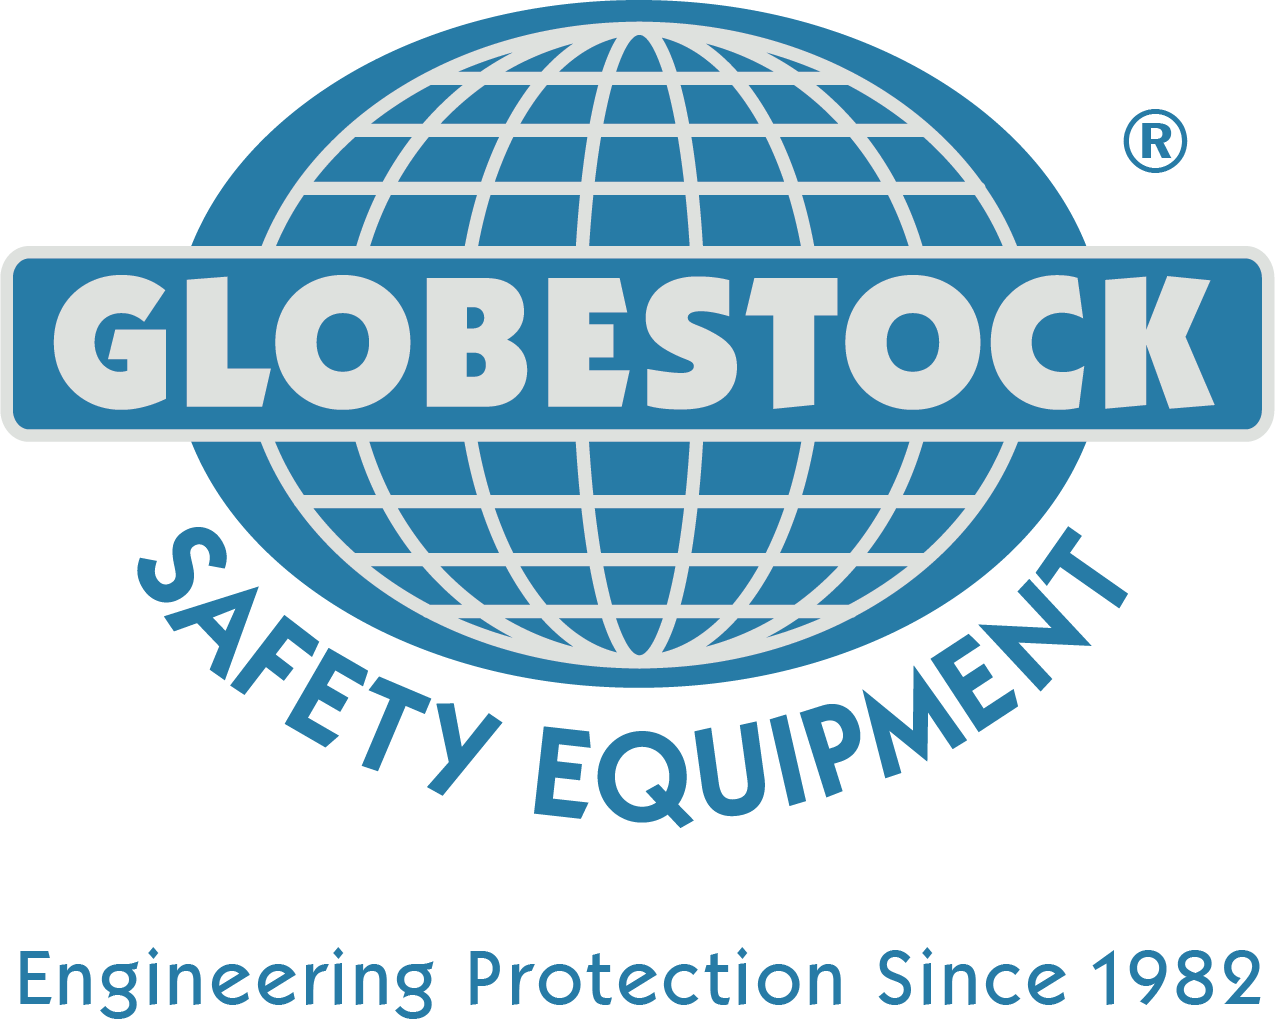 Globestock Safety Equipment